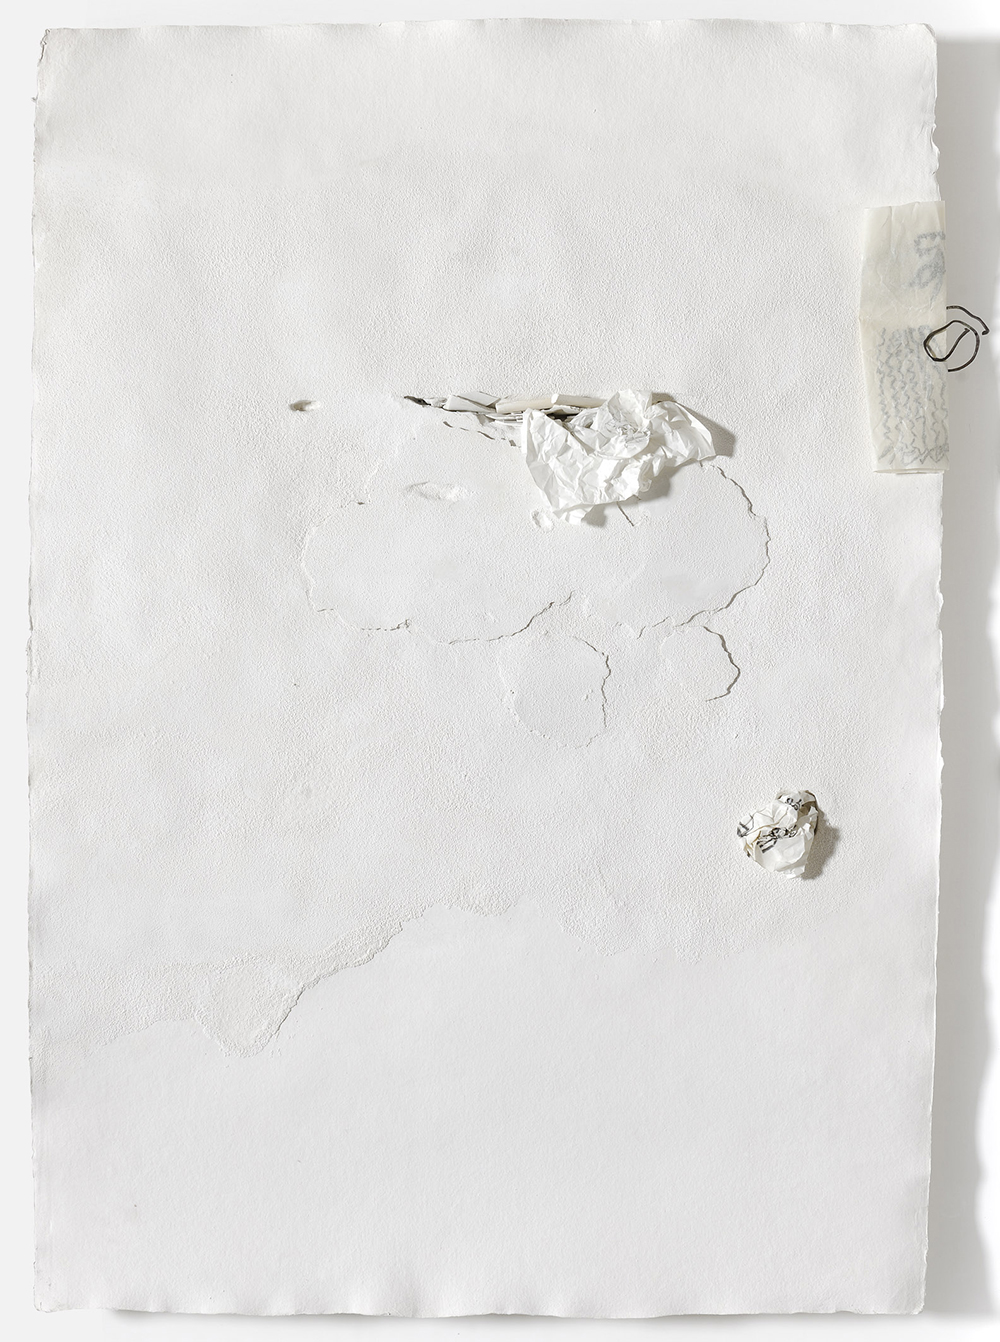 Museo ideale, 2011, tecnica mista su carta, scagliola, rame ossidato, cm 134x94